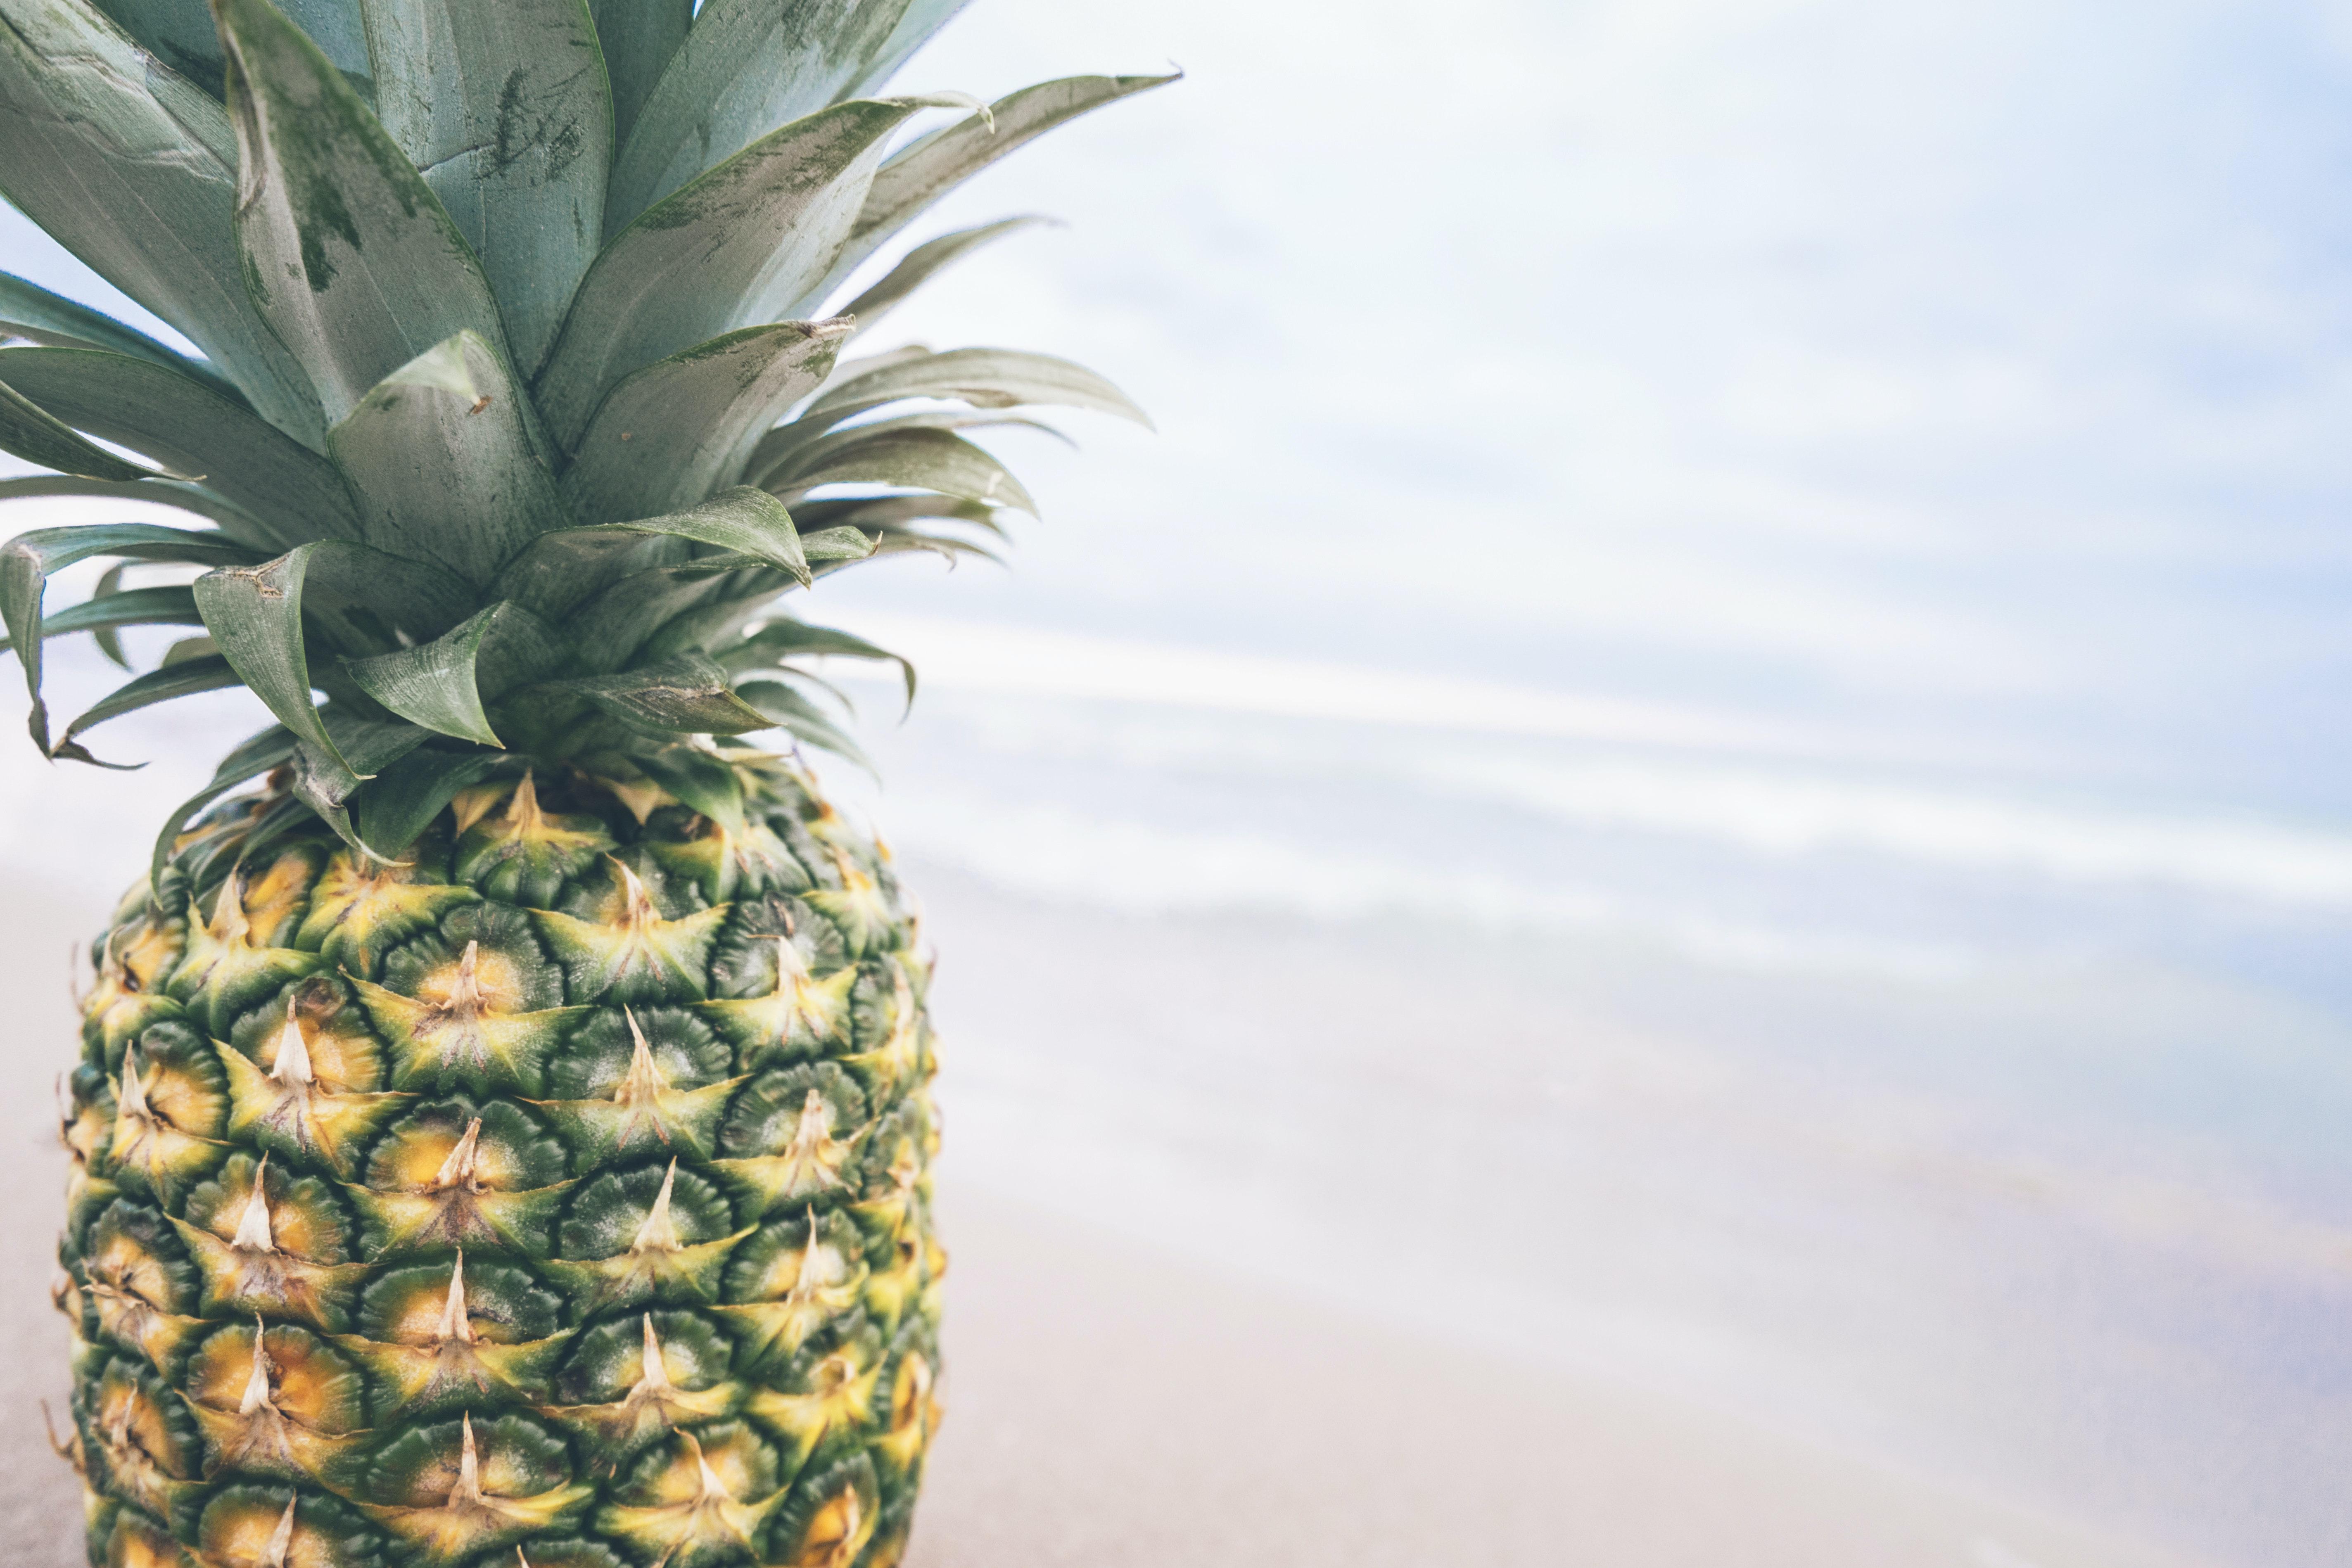 Pineapple Fruit On Shore 183 Free Stock Photo